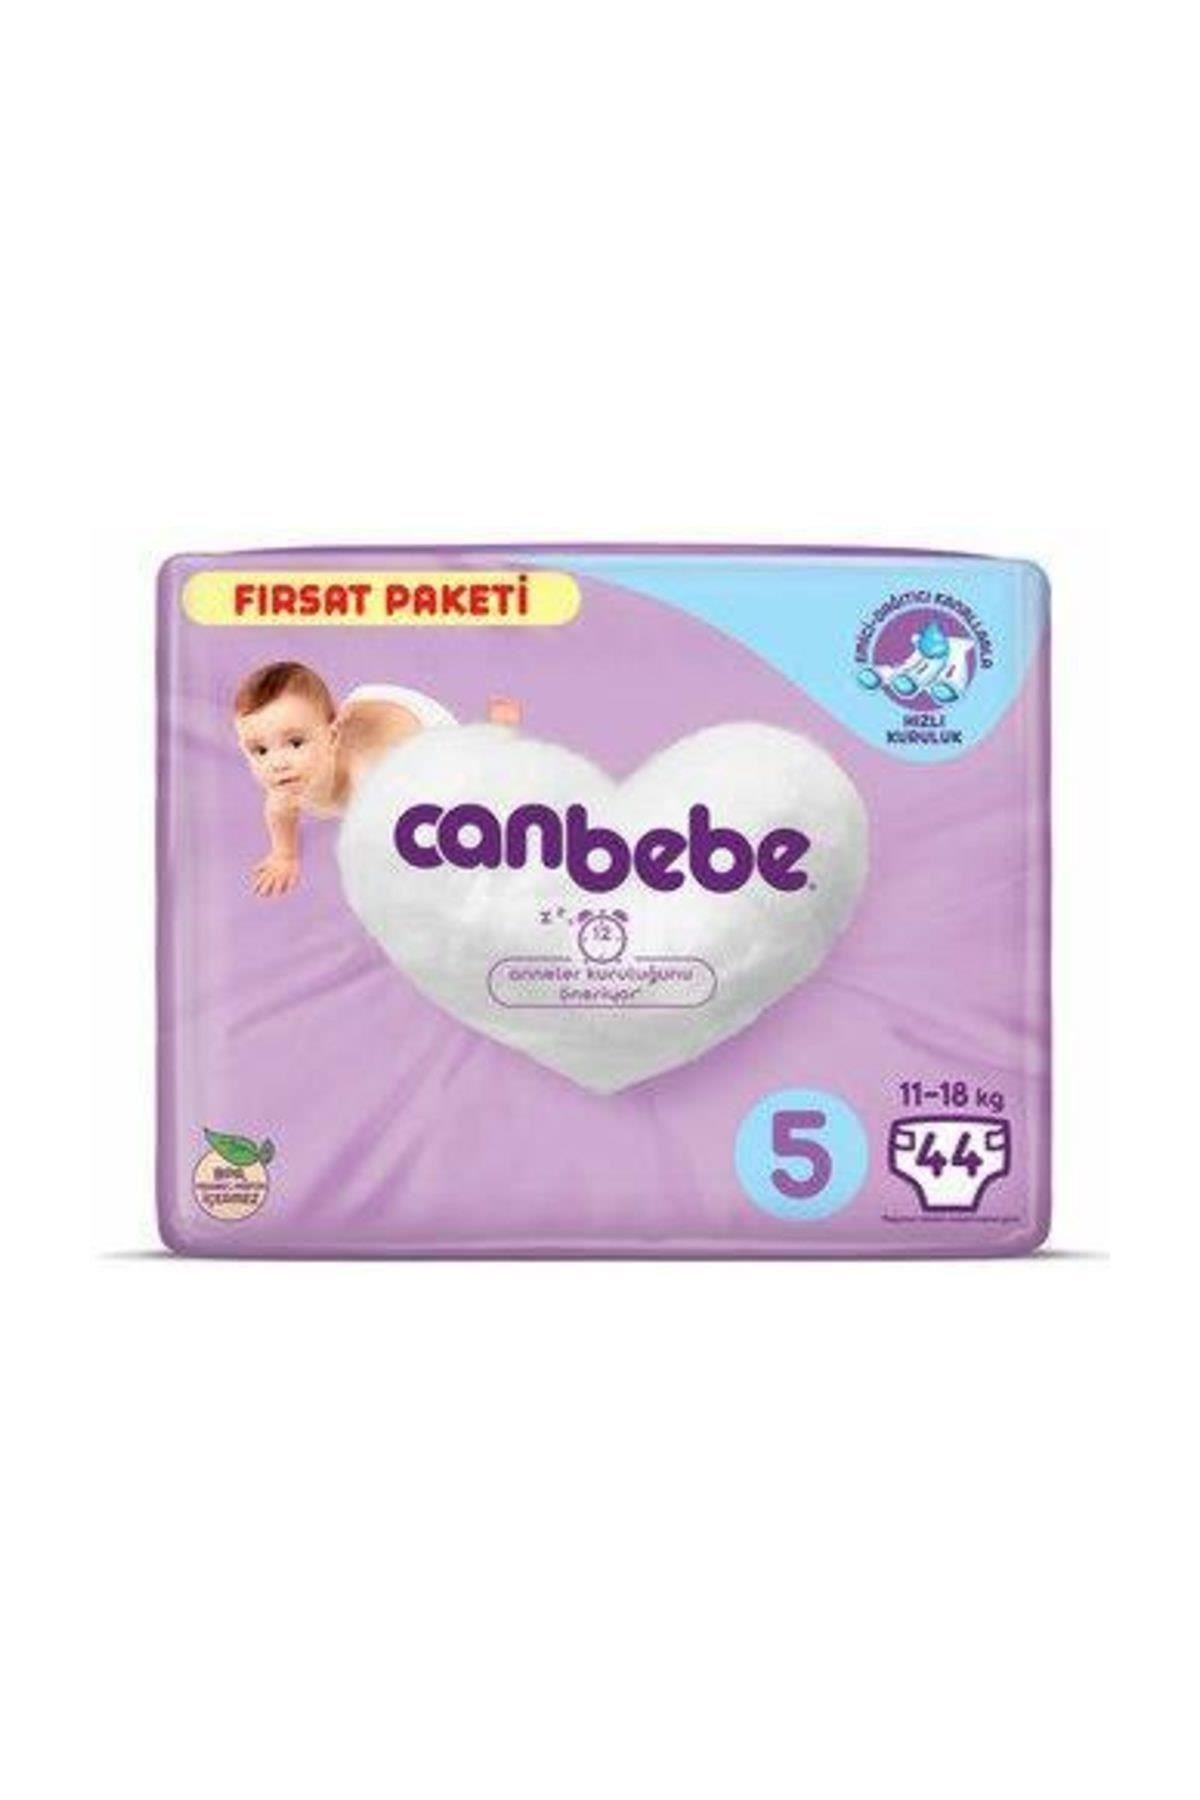 Canbebe Bebek Bezi Fırsat Paketi 5 Beden 11-18 Kg 44 Adet